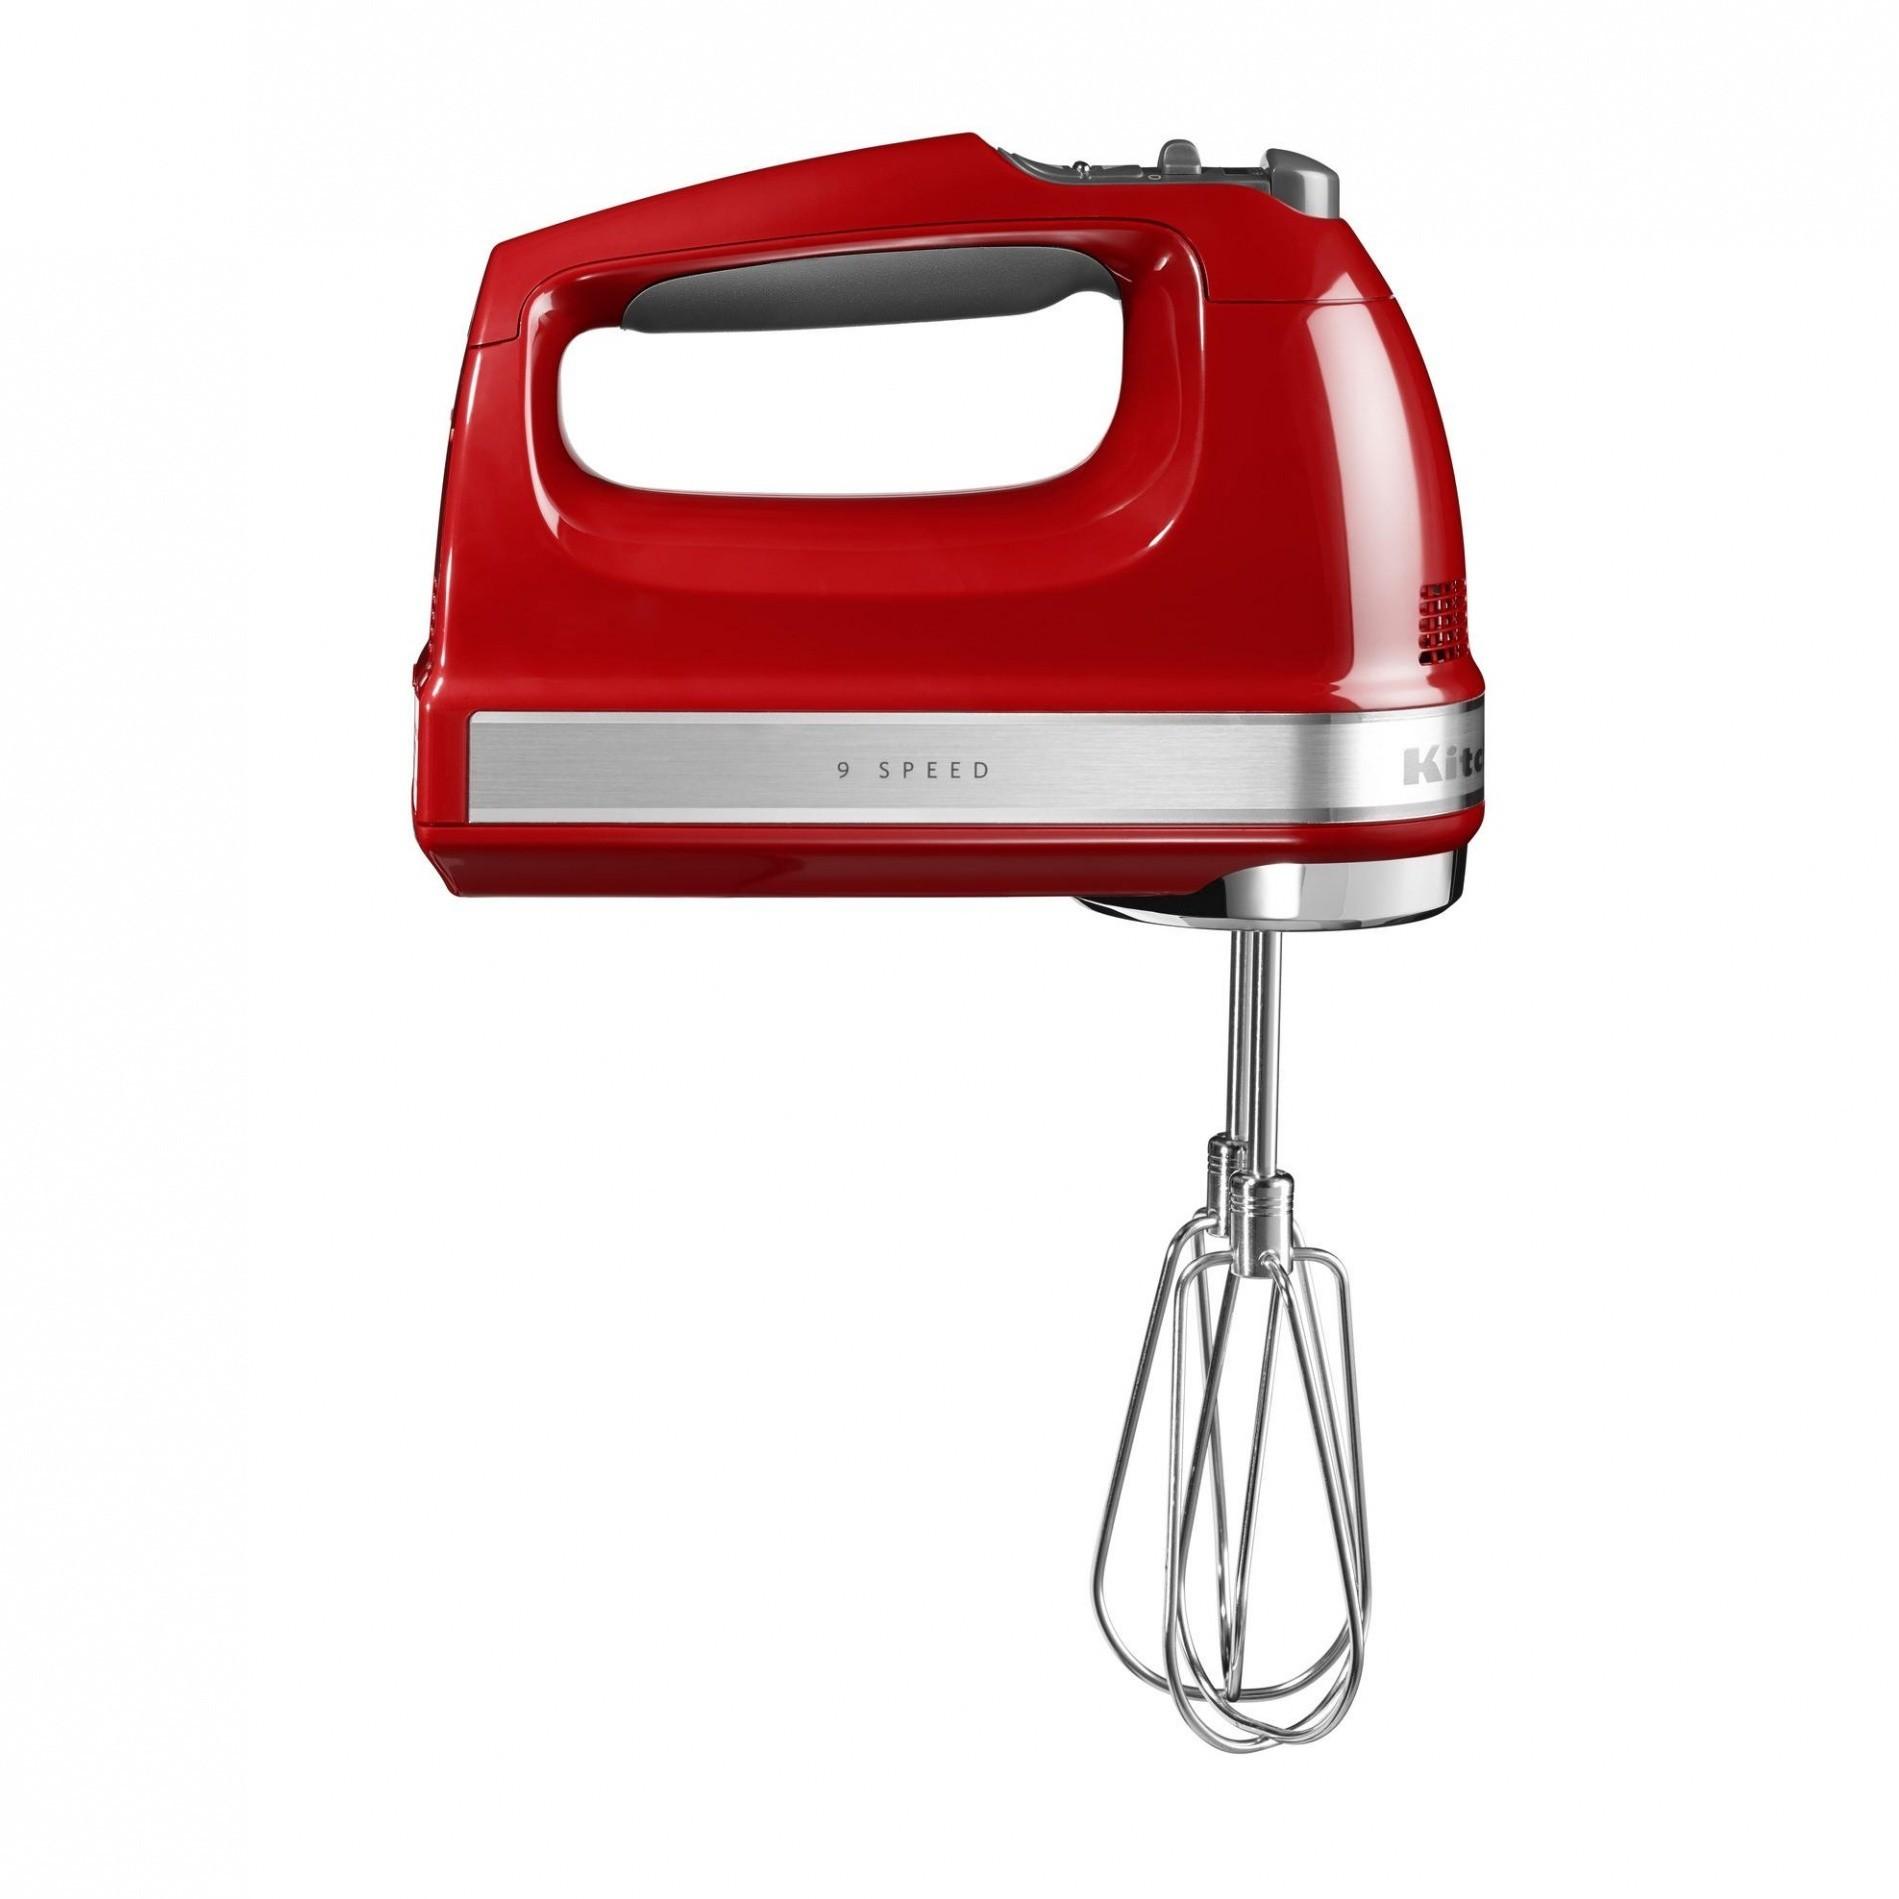 Kitchenaid 5khm9212 Hand Mixer Ambientedirect